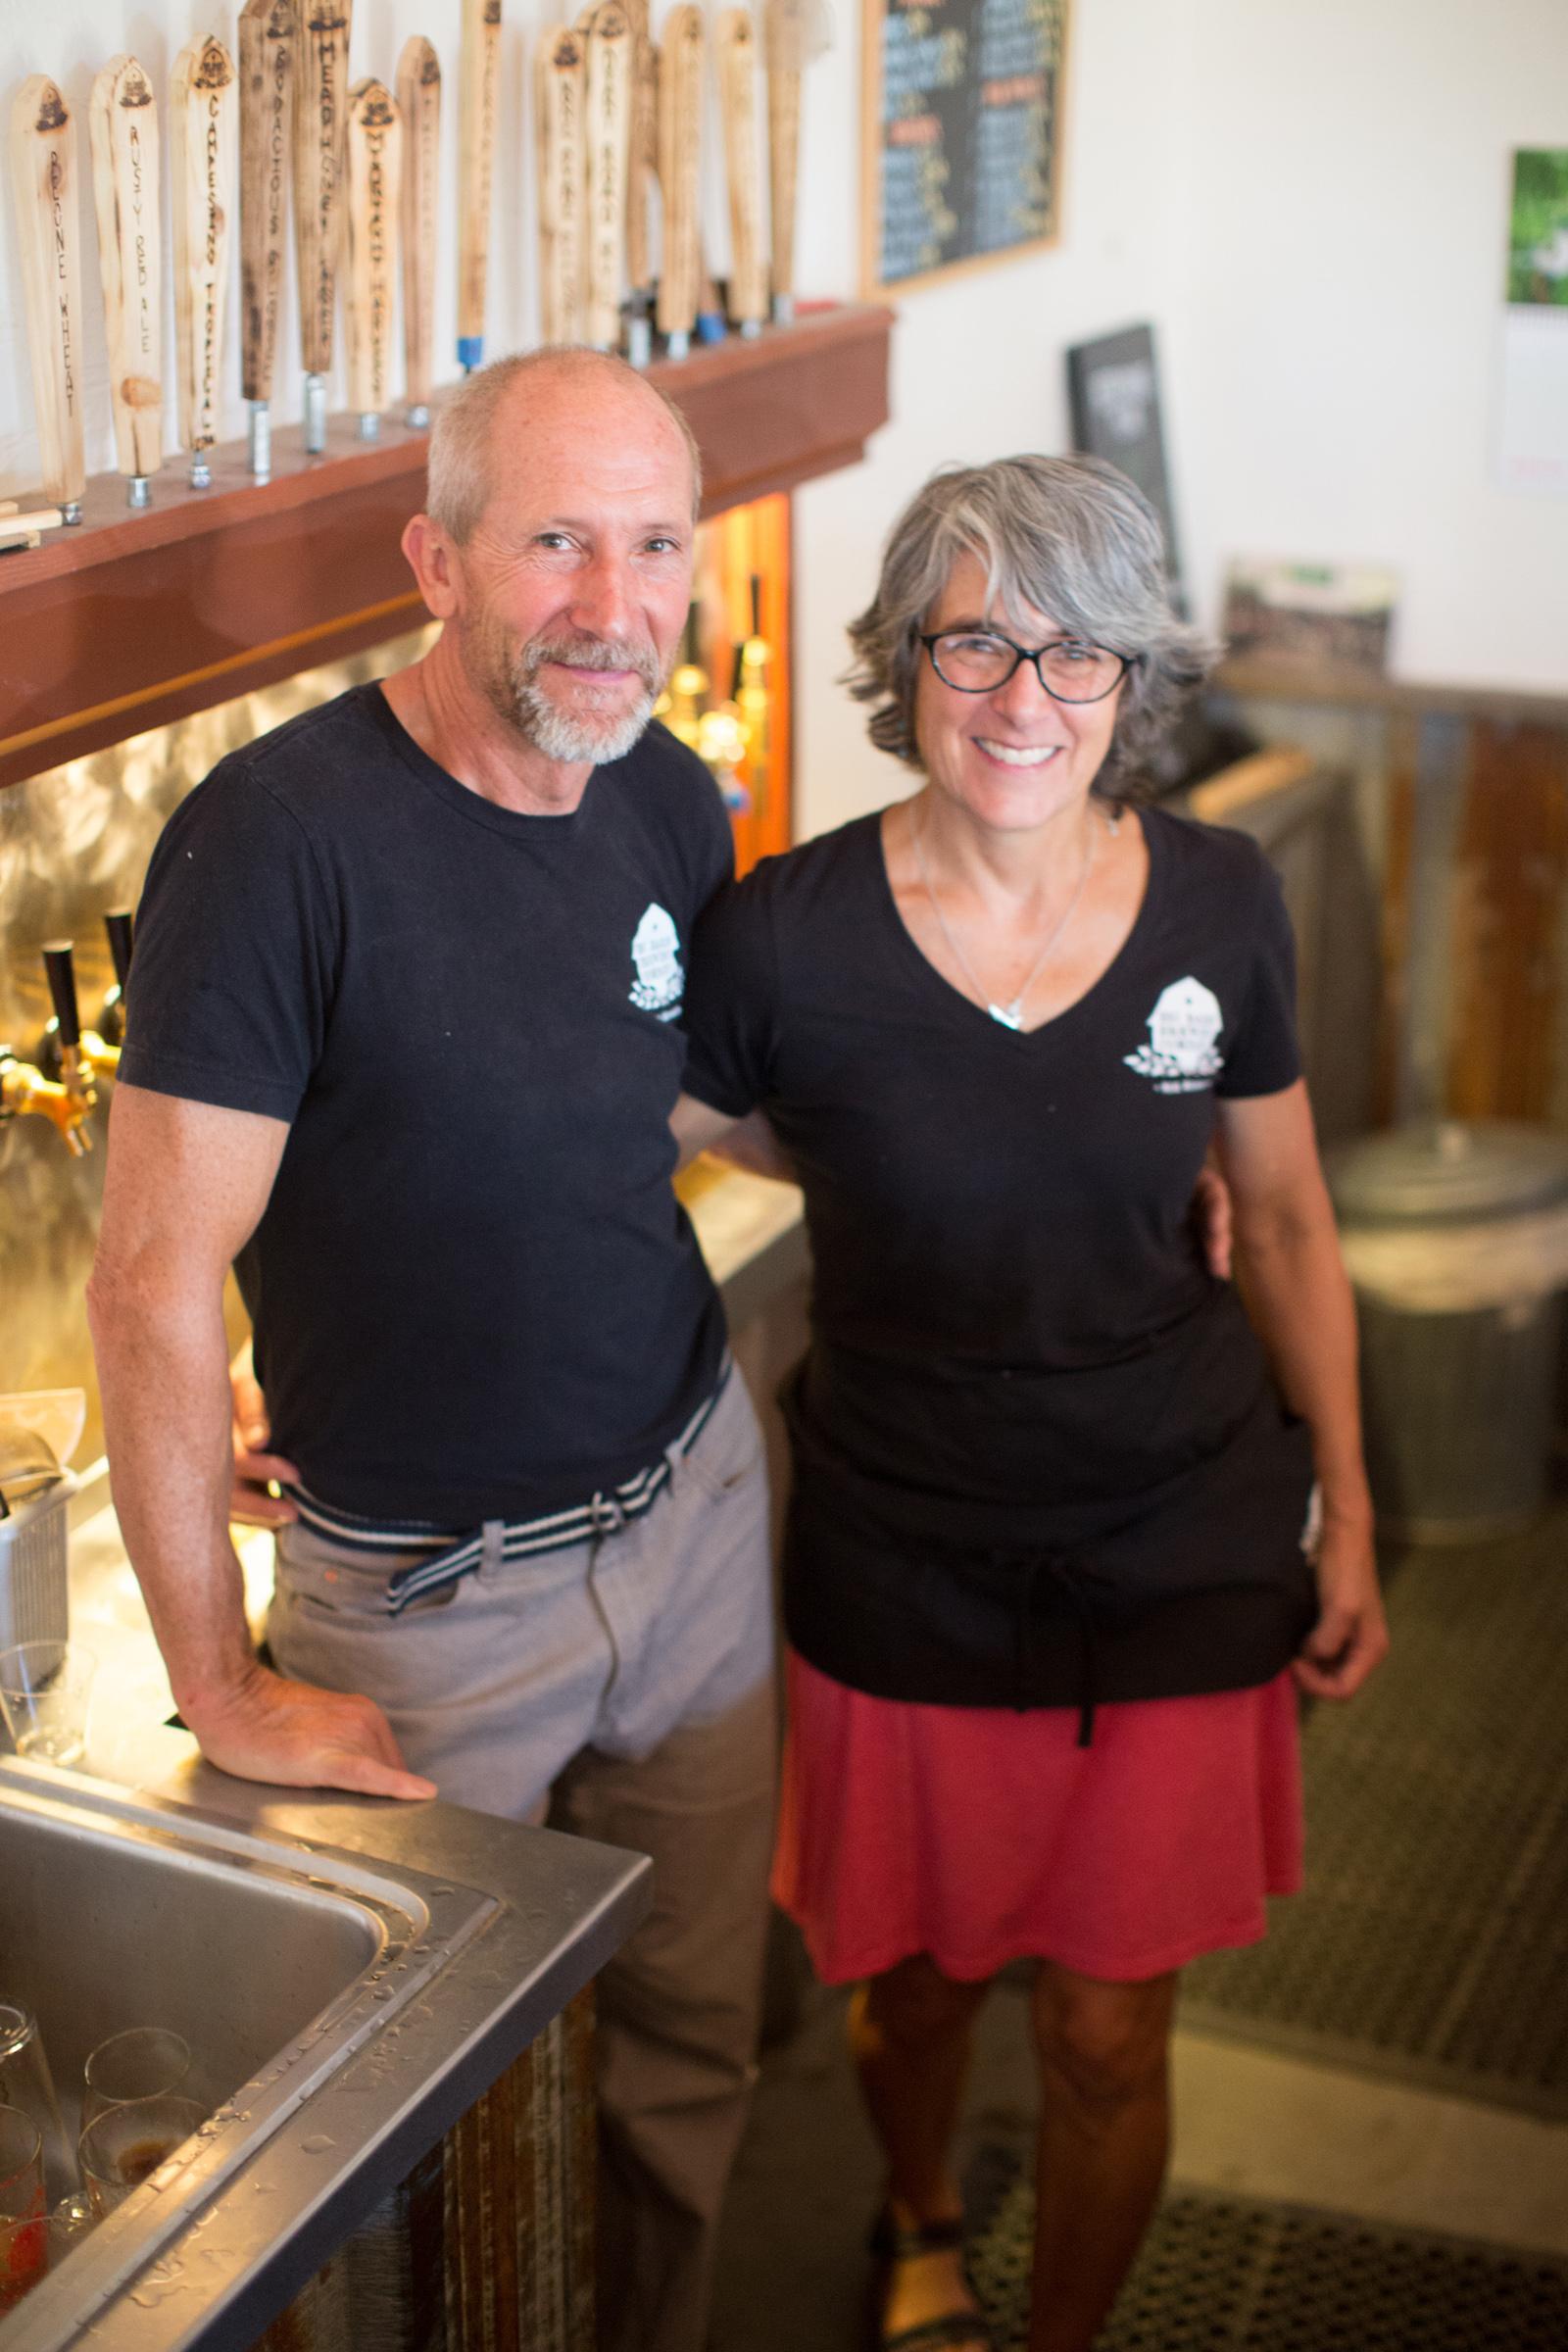 Craig and Jane Deitz, owners of Big Barn Brewing